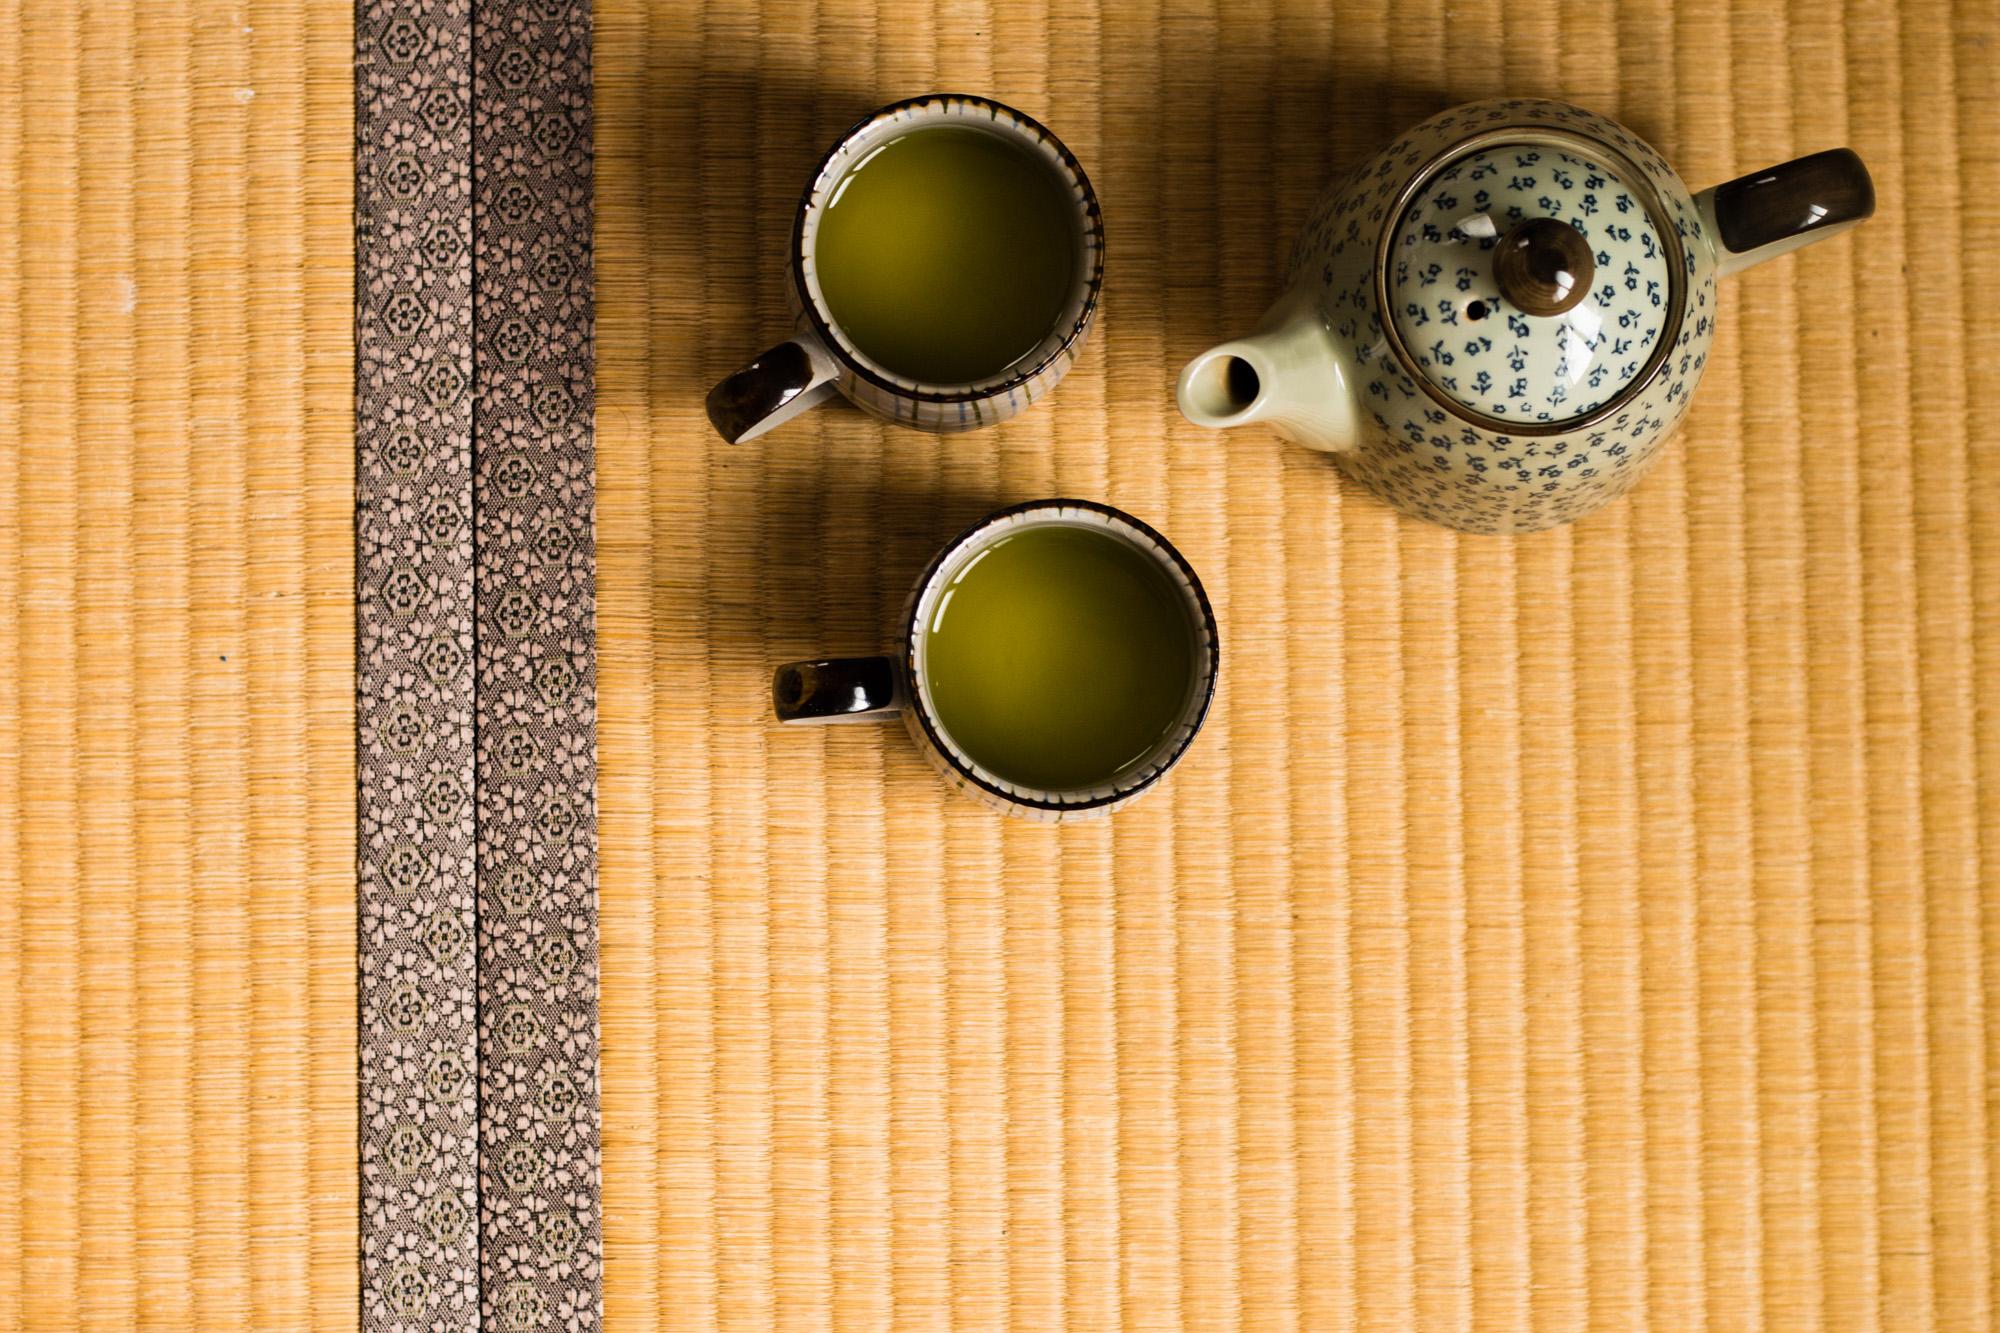 Green tea, Japan